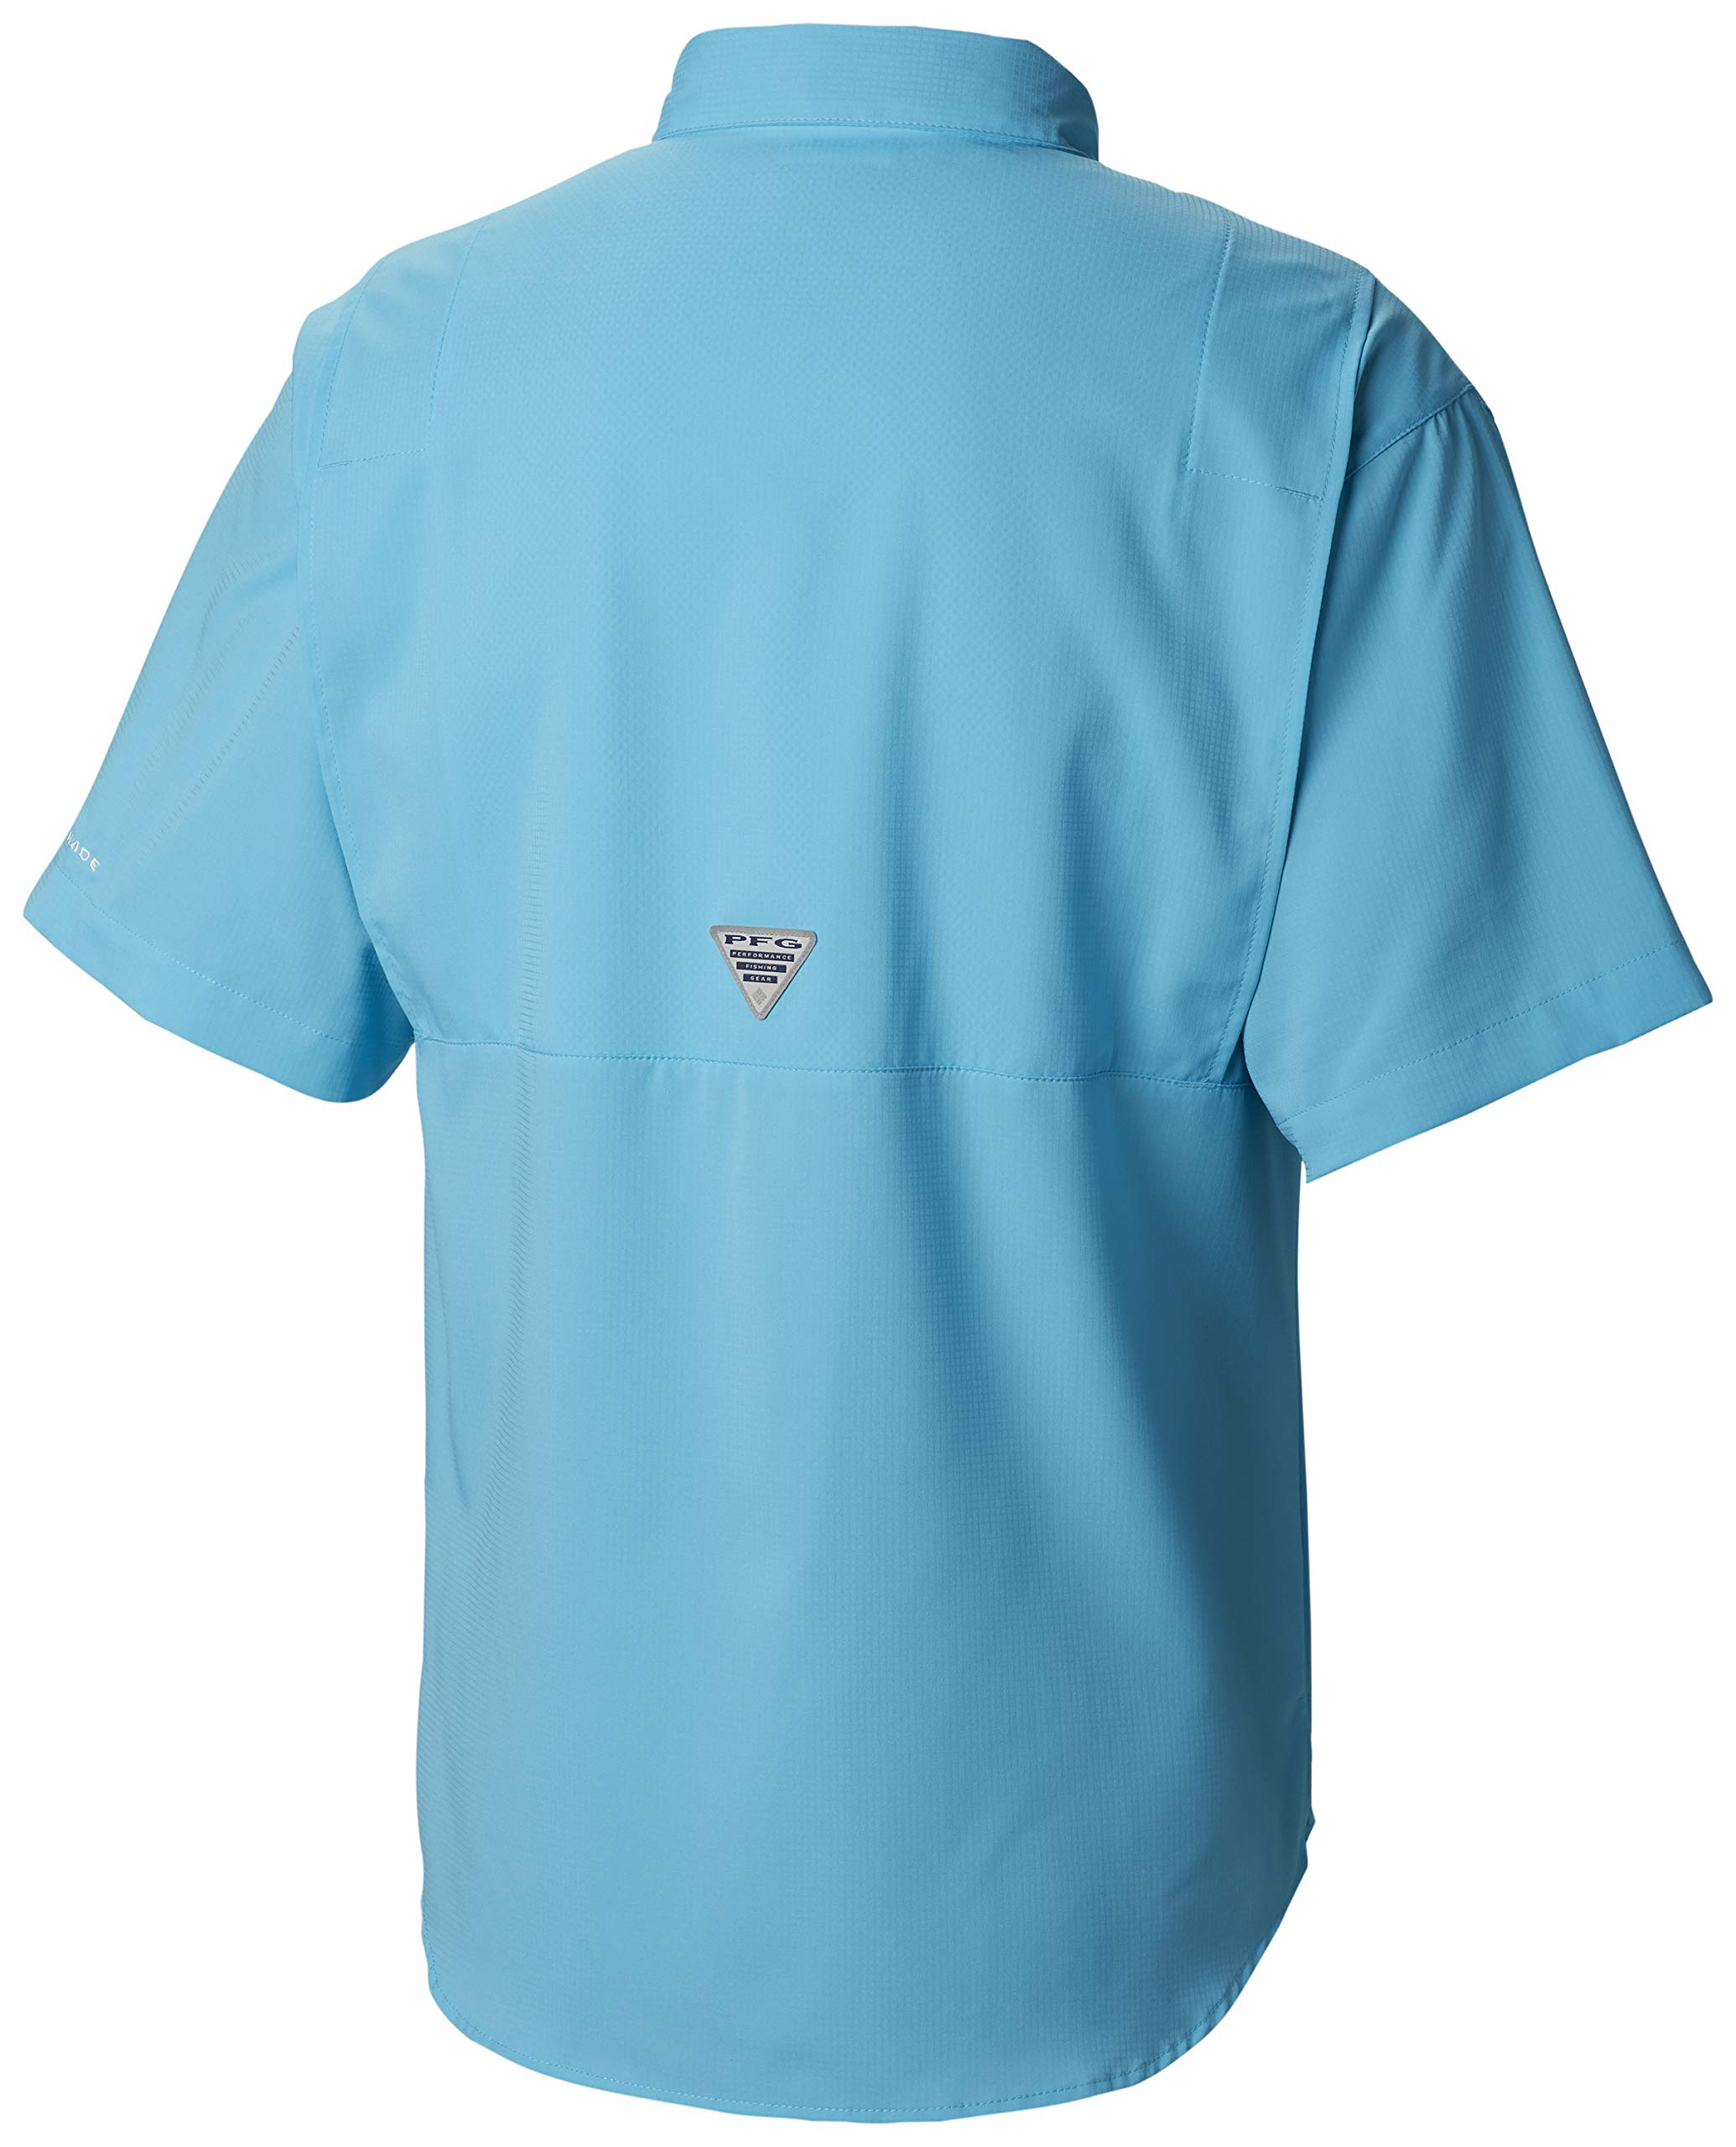 Columbia Men's Tamiami Ii Short Sleeve Shirt, Atoll, Small by Columbia (Image #2)